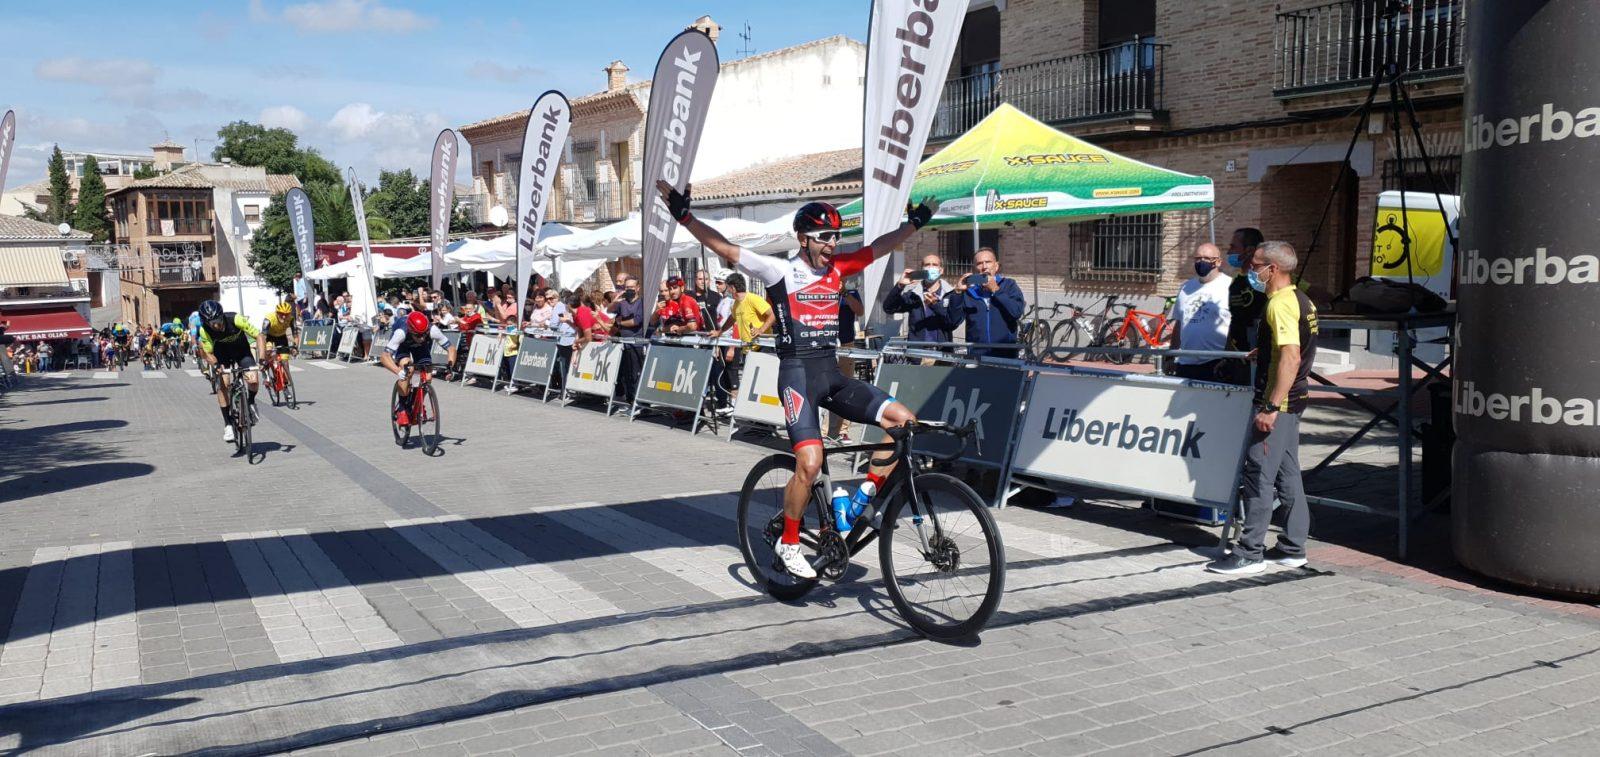 Javier Hernández Olías del Rey Tenerife BikePoint Pizzería Española